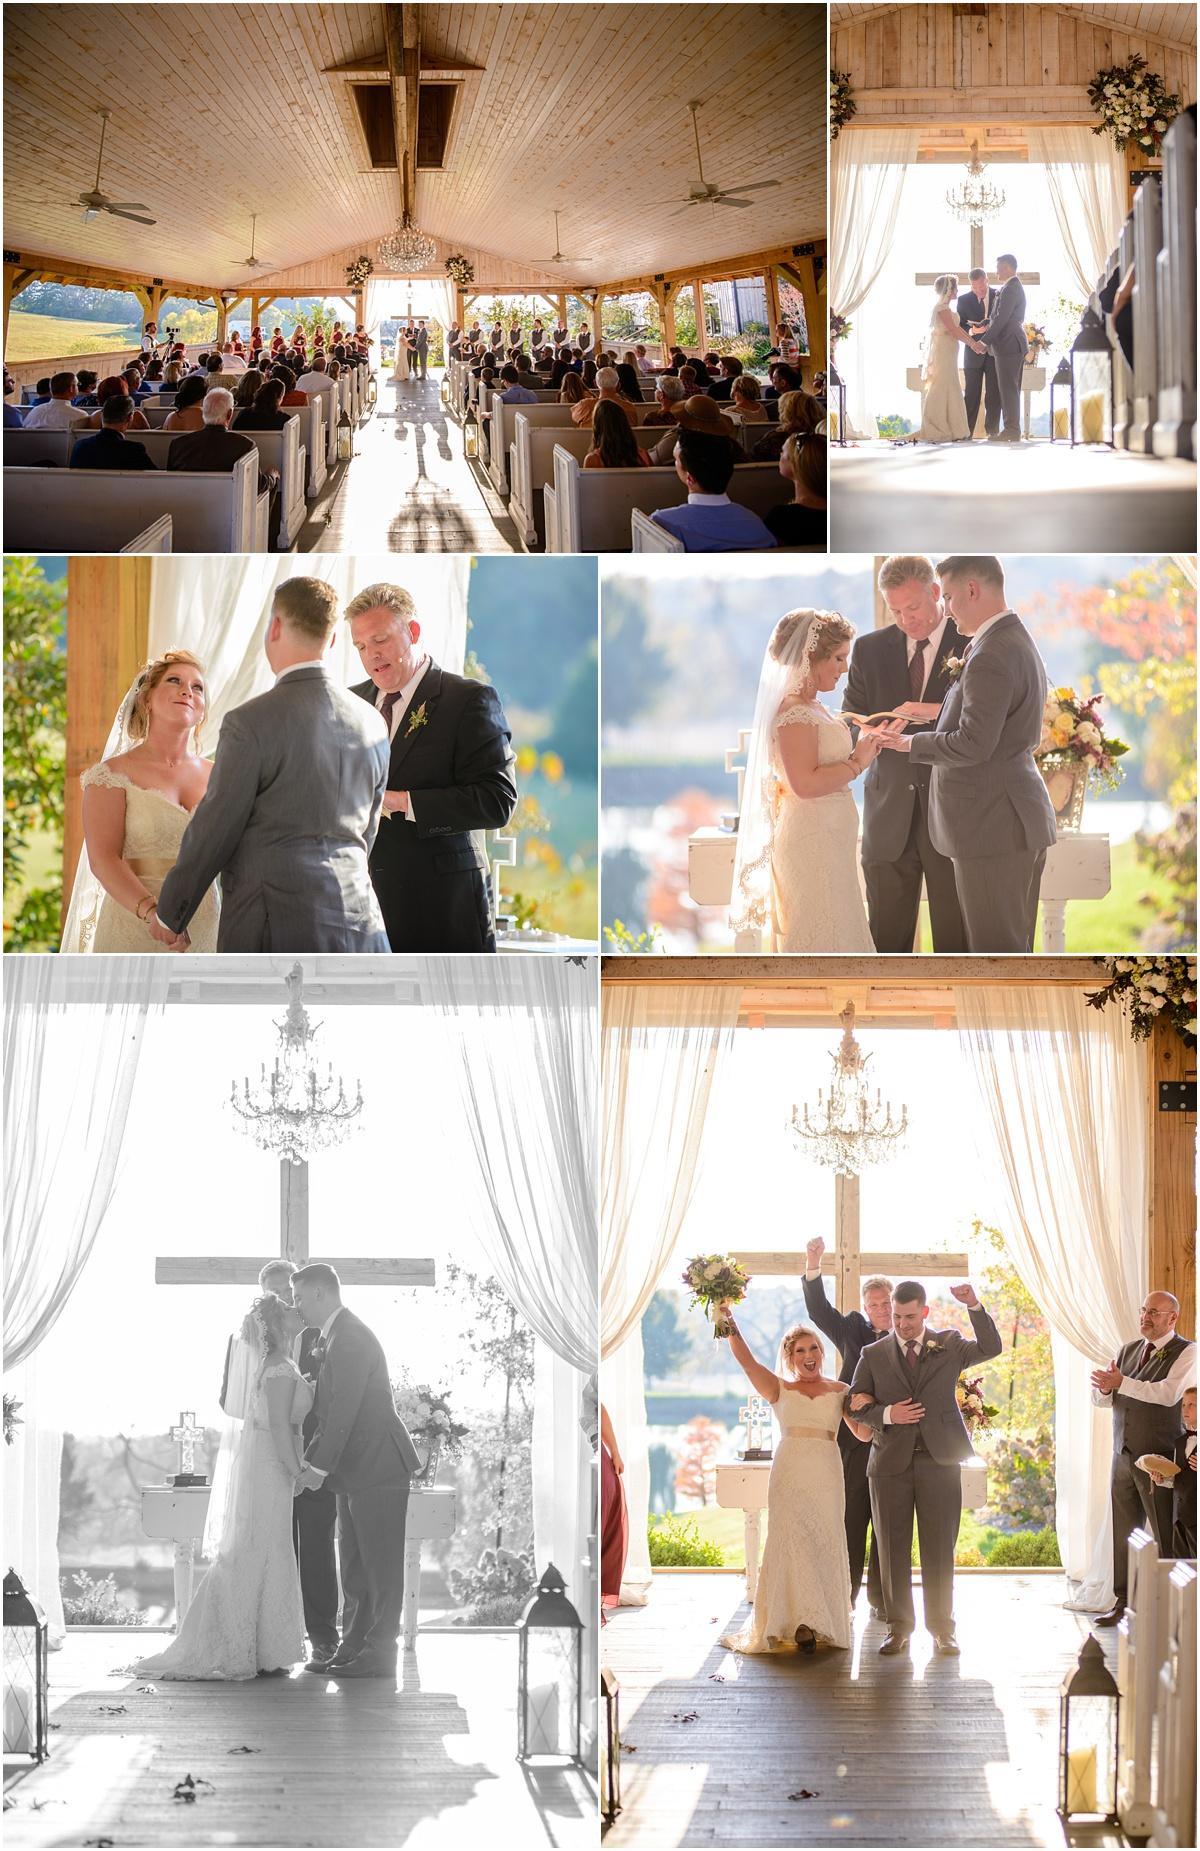 Greg Smit Photography Nashville wedding photographer Mint Springs Farm_0229